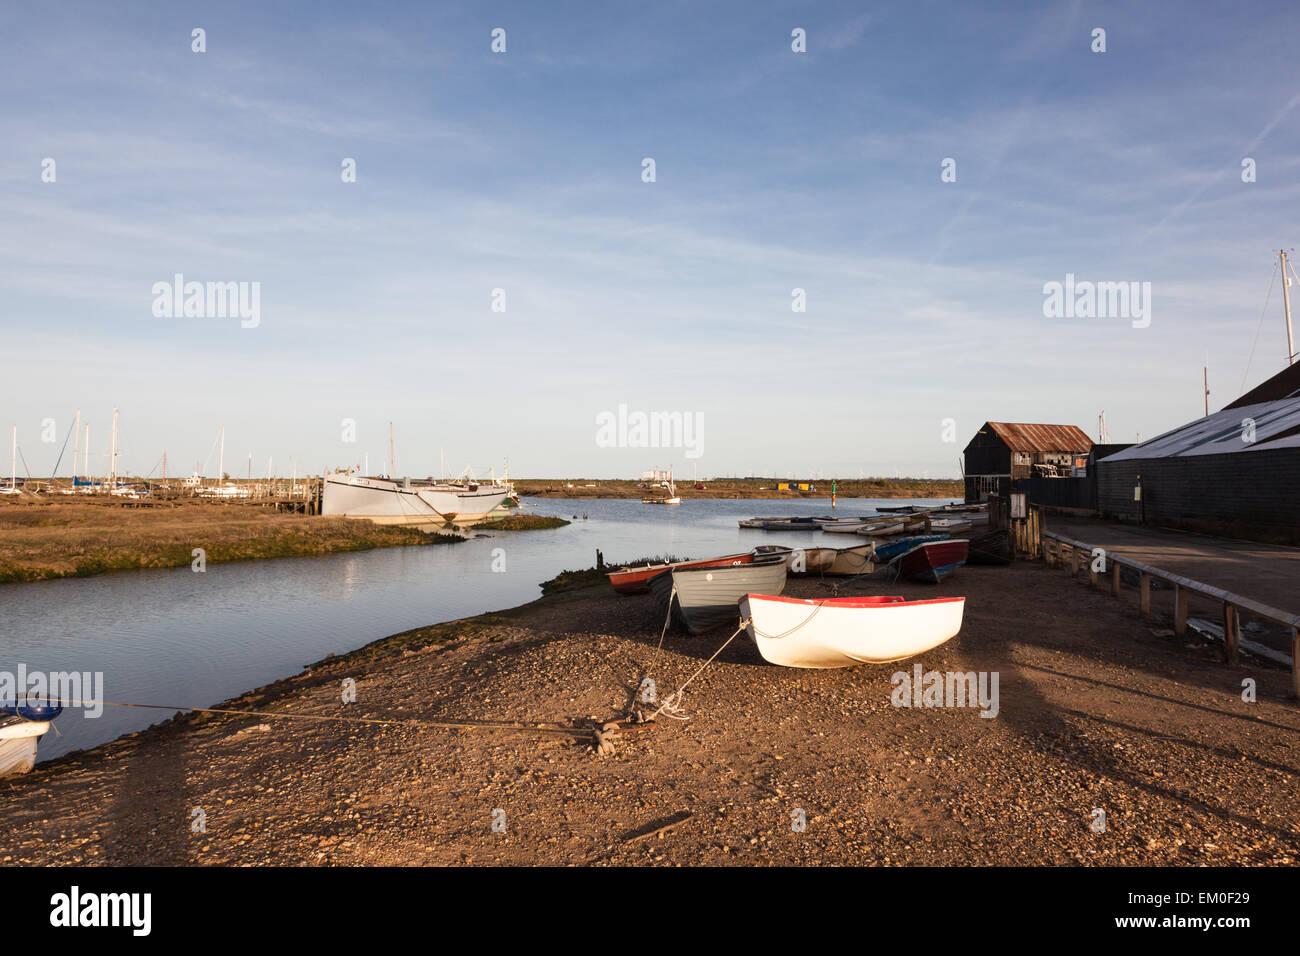 Boats moored on Tollesbury Creek amongst the Saltings, Tollesbury, Essex, UK Stock Photo